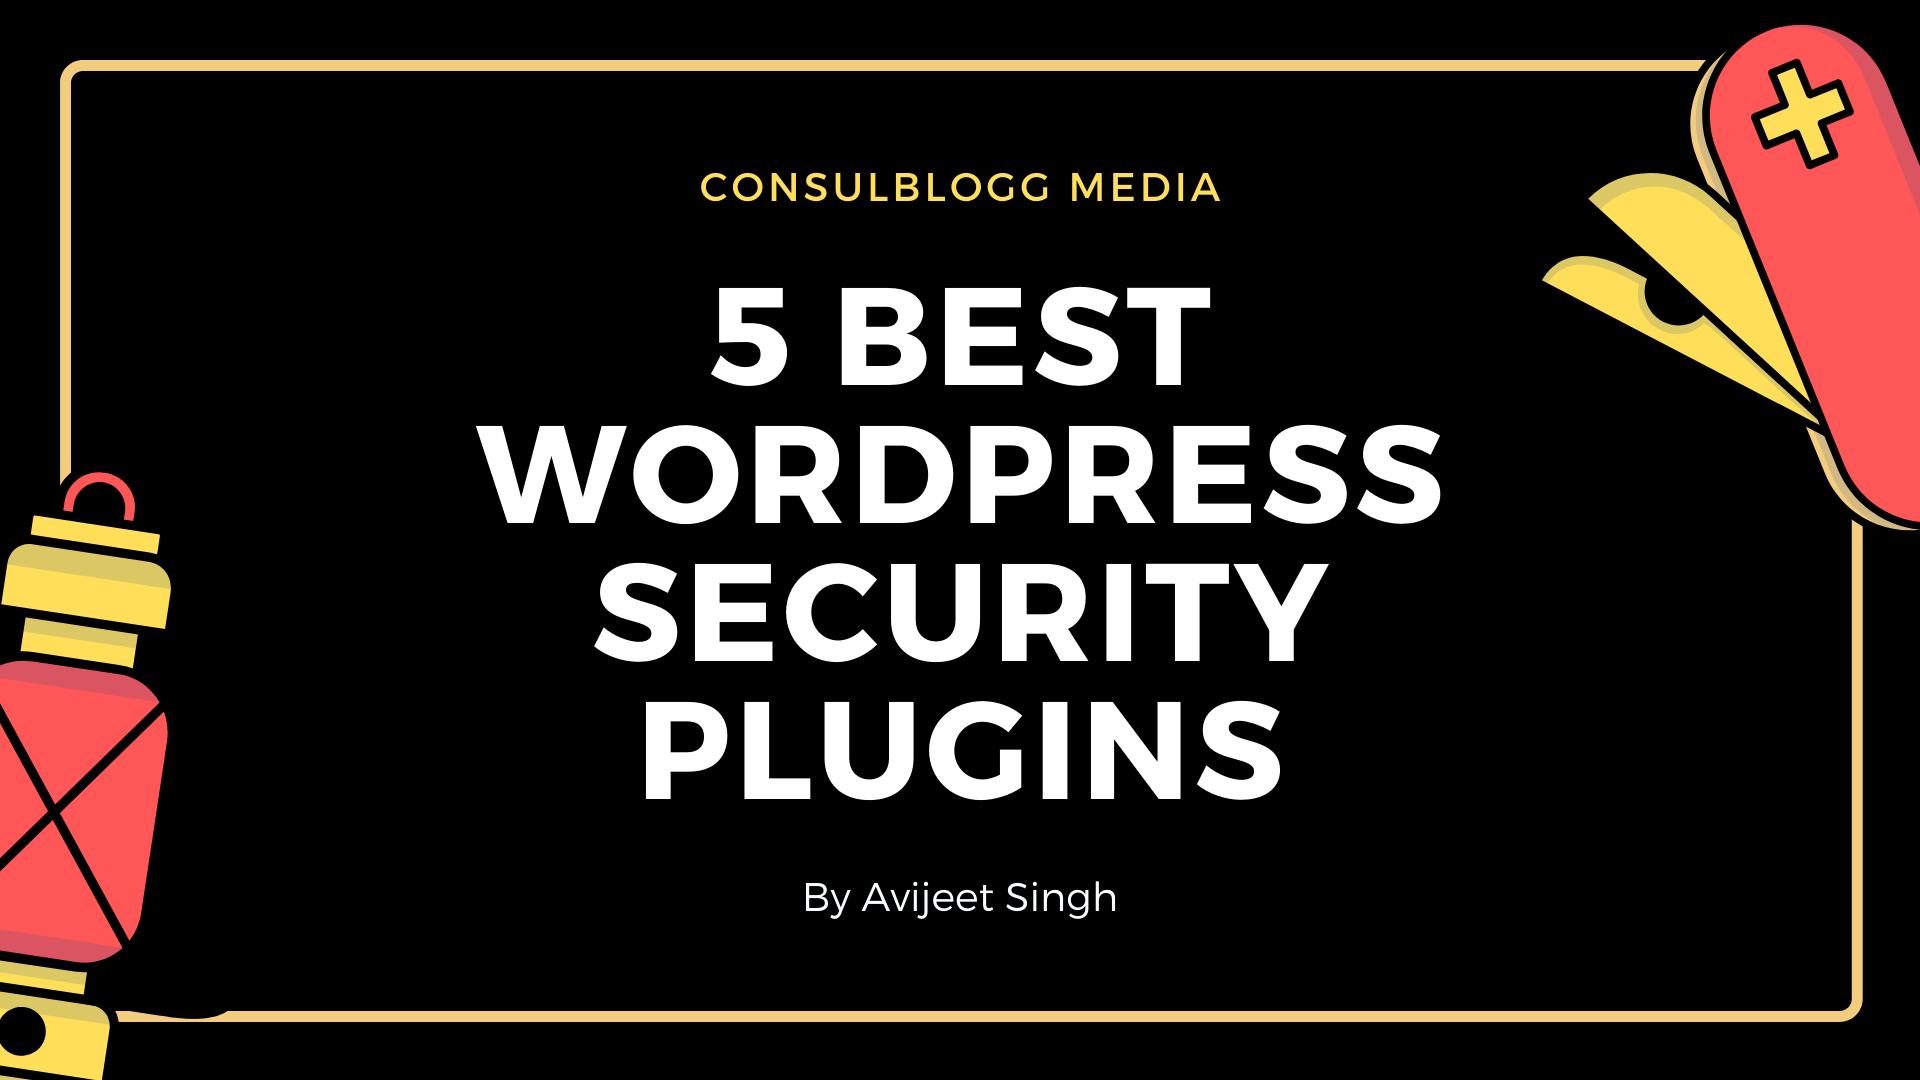 5 Best WordPress Security Plugins